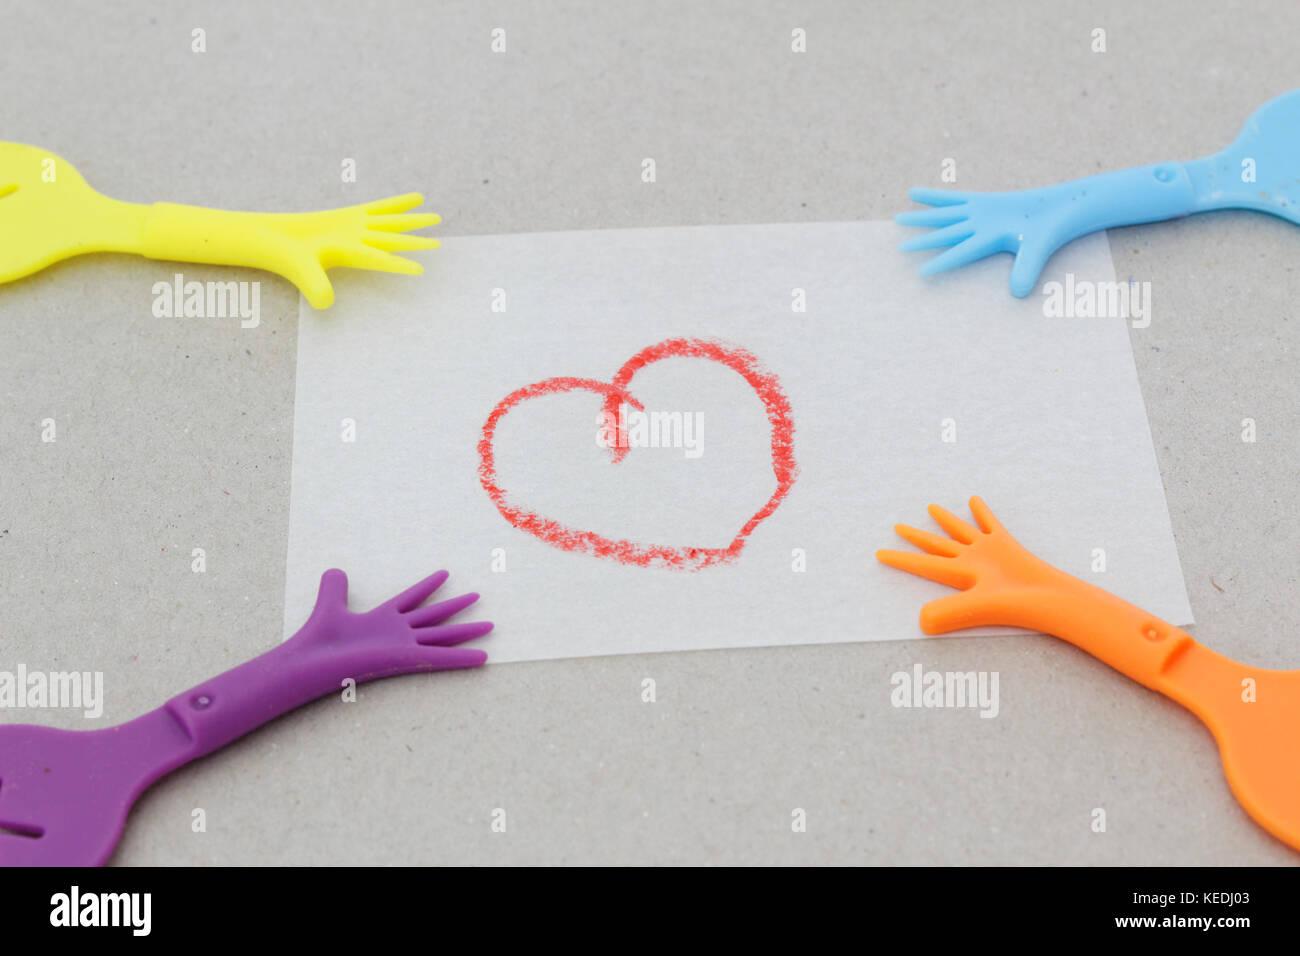 Replica of hand pulling paper with love symbol. Concept of divorce,child custody,matrinomial. - Stock Image